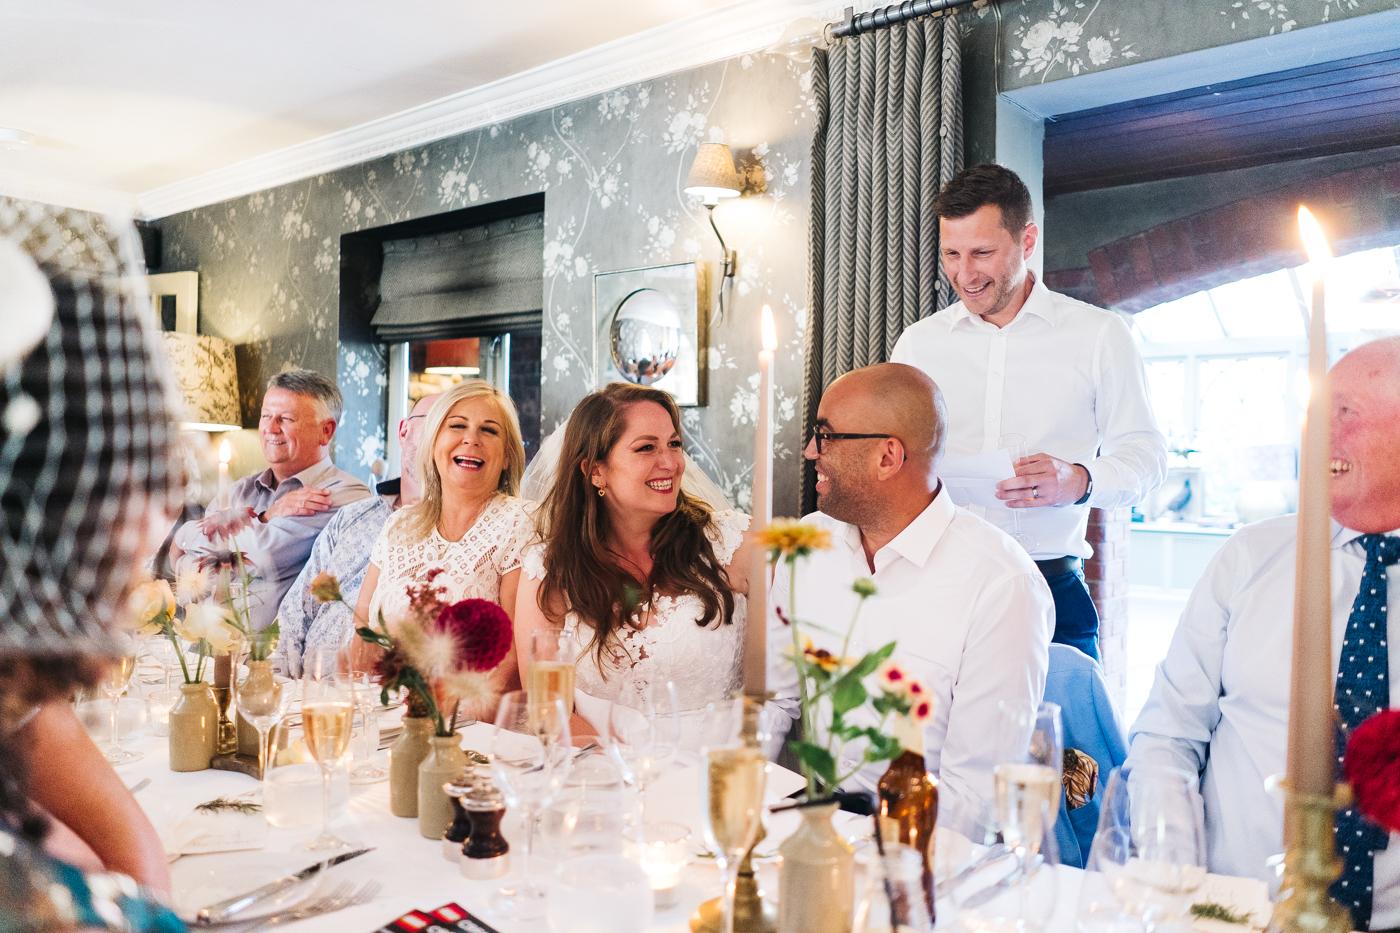 wedding-at-the-pheasant-harome-helmsley-north-yorkshire-wedding-photographer-0042.jpg